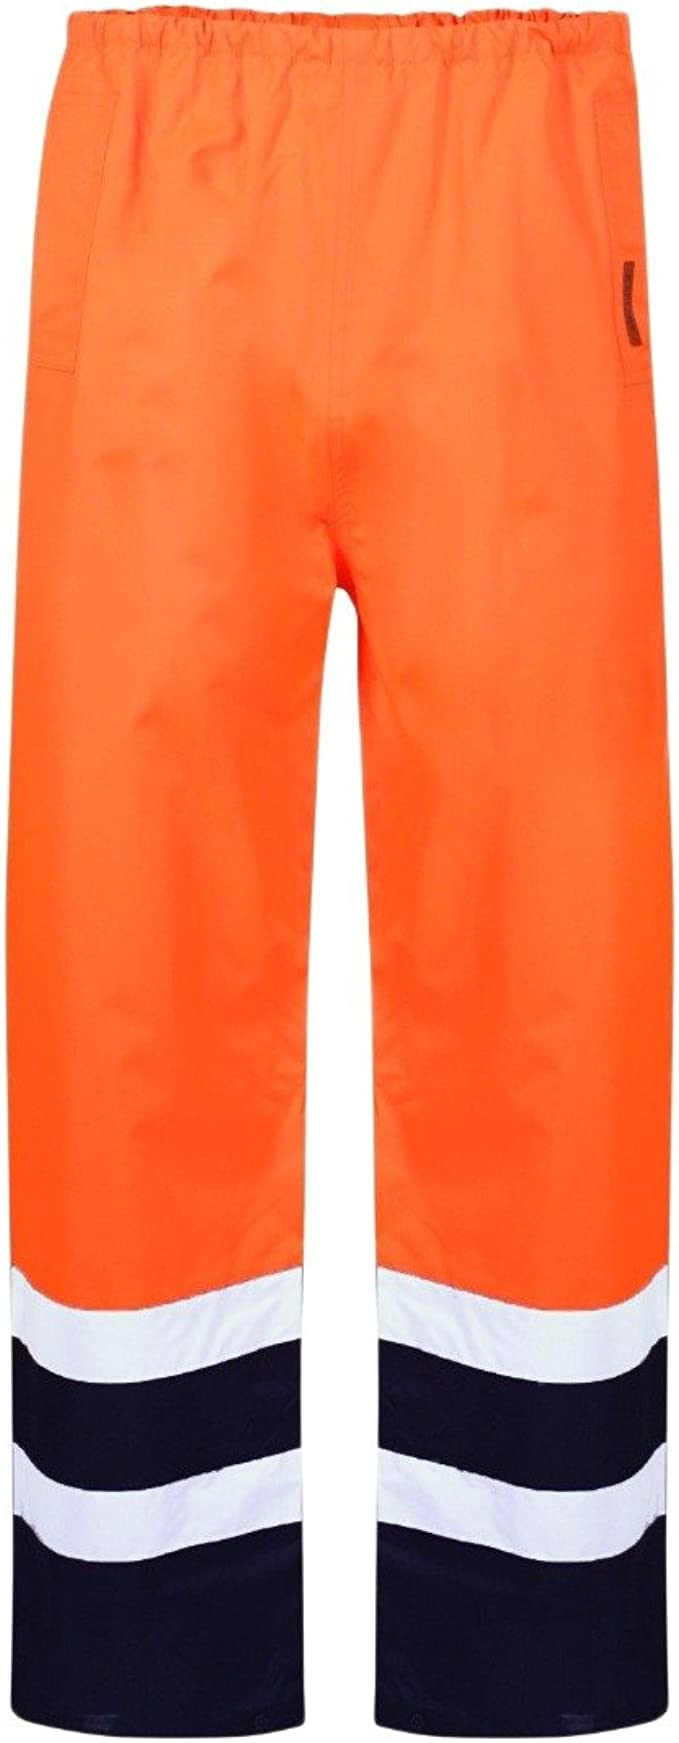 Bandas MyShoeStore de alta visibilidad el/ásticas e impermeables de poliuretano para cintura o pantalones 2 unidades tallas de S a 4XL